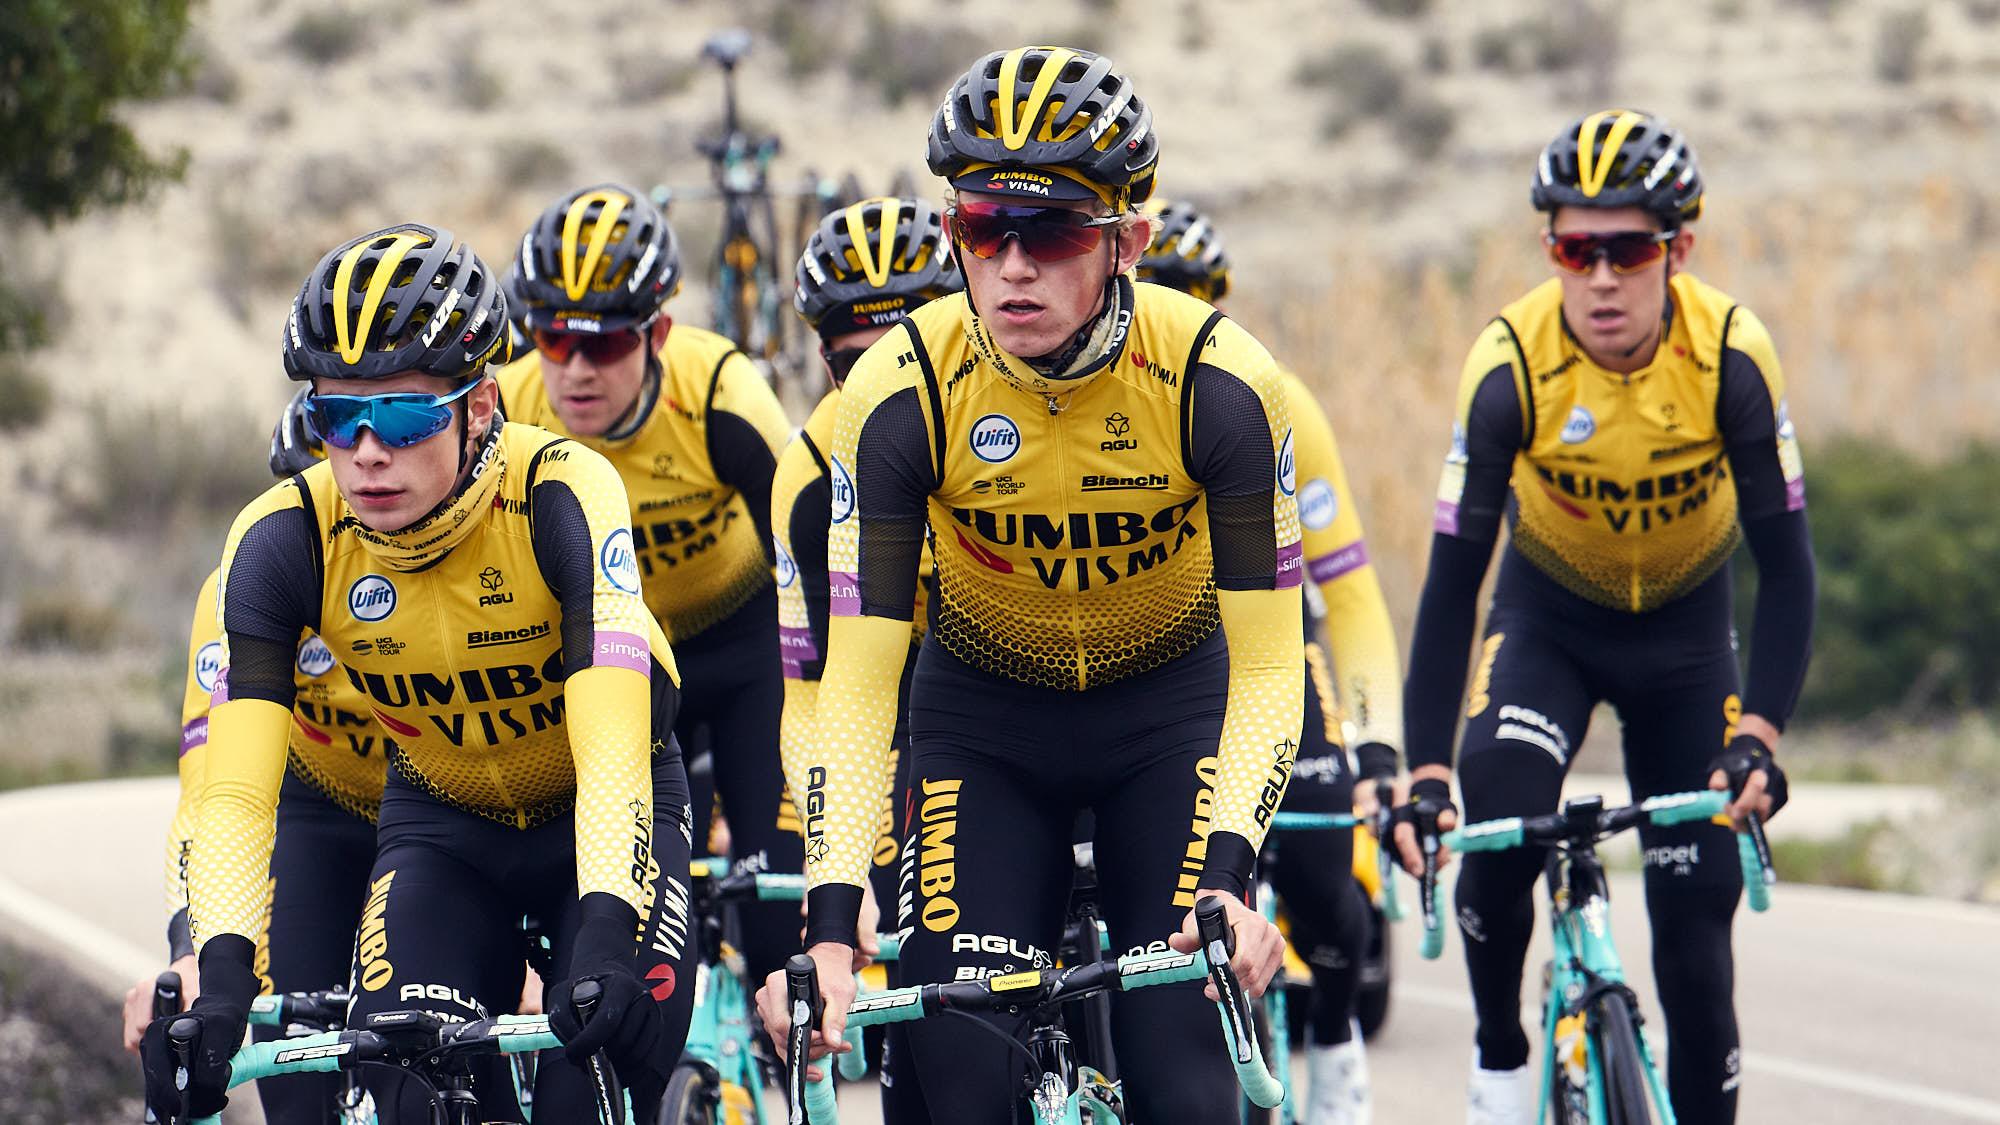 Jumbo-Visma rider Koen Bouwman training in Alicante